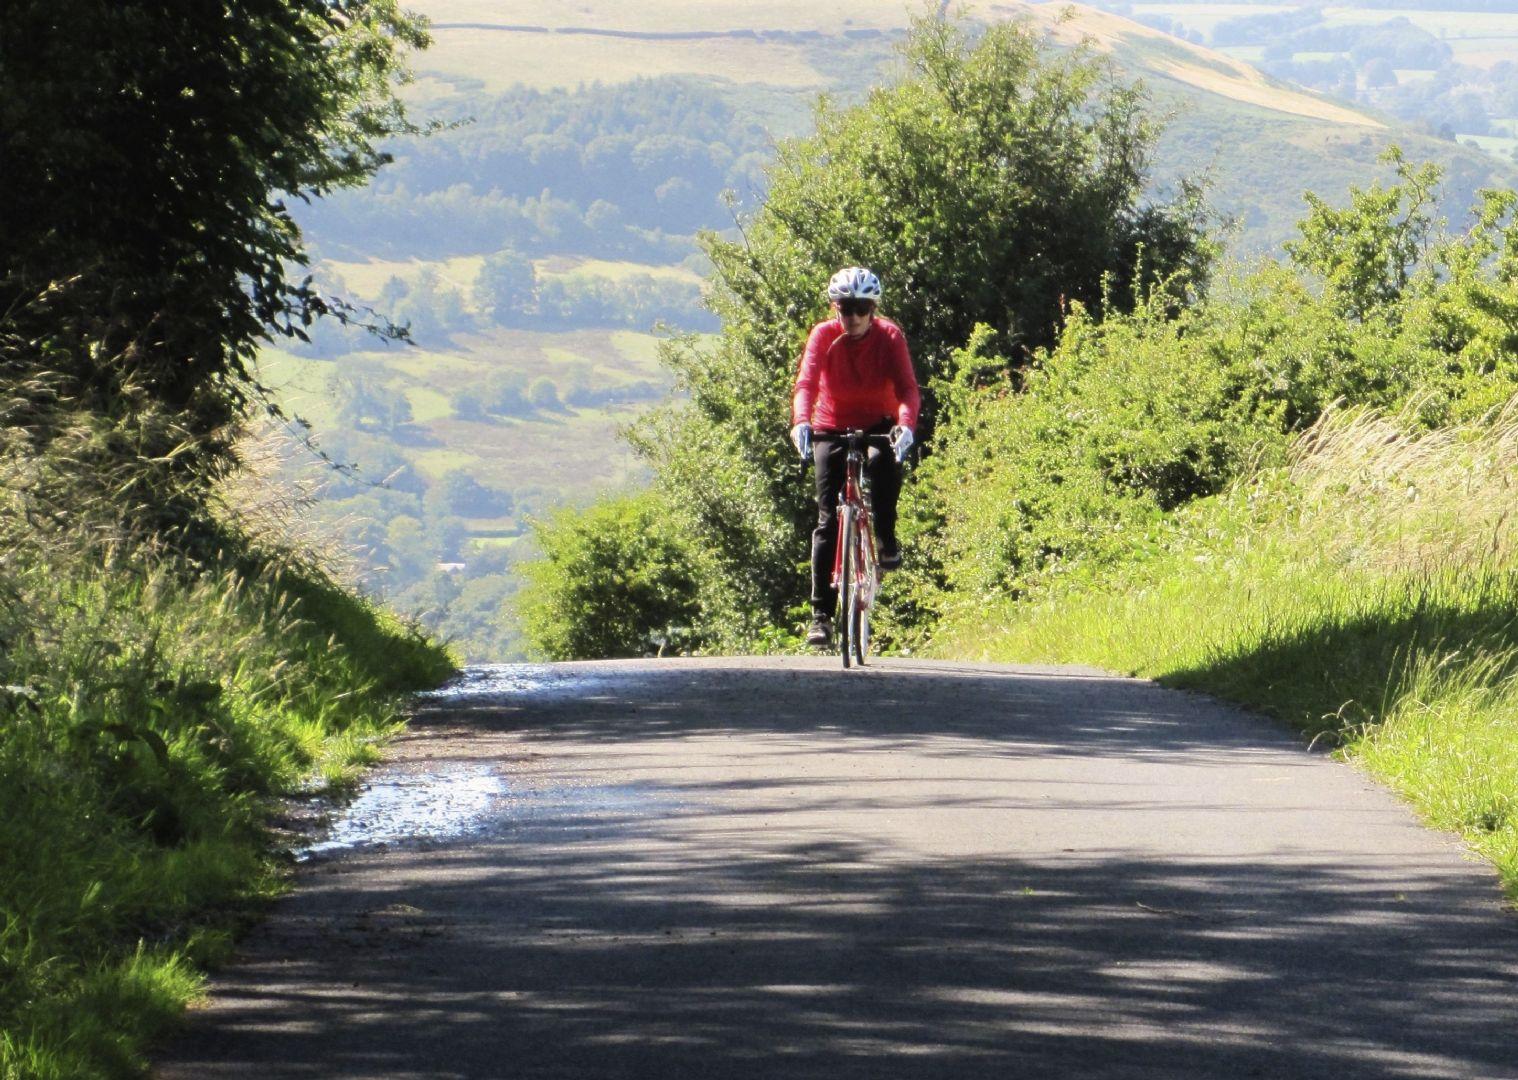 _Customer.73824.11942.jpg - UK - C2C - Coast to Coast 4 Days Cycling - Self-Guided Leisure Cycling Holiday - Leisure Cycling